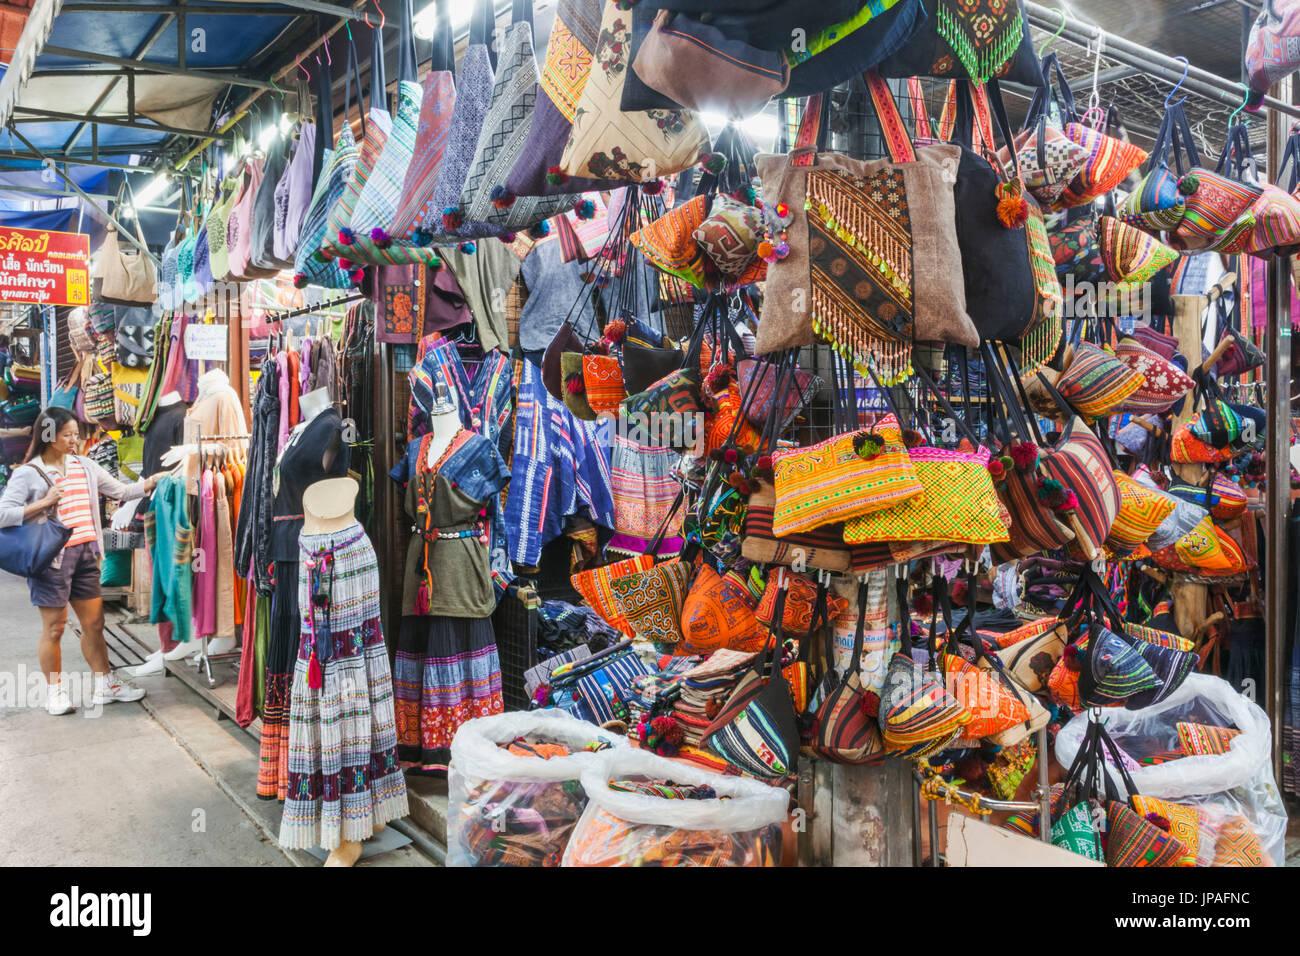 Thailand, Bangkok, Chatuchak Market, Shop Display of Ethnic Hilltribe Products - Stock Image